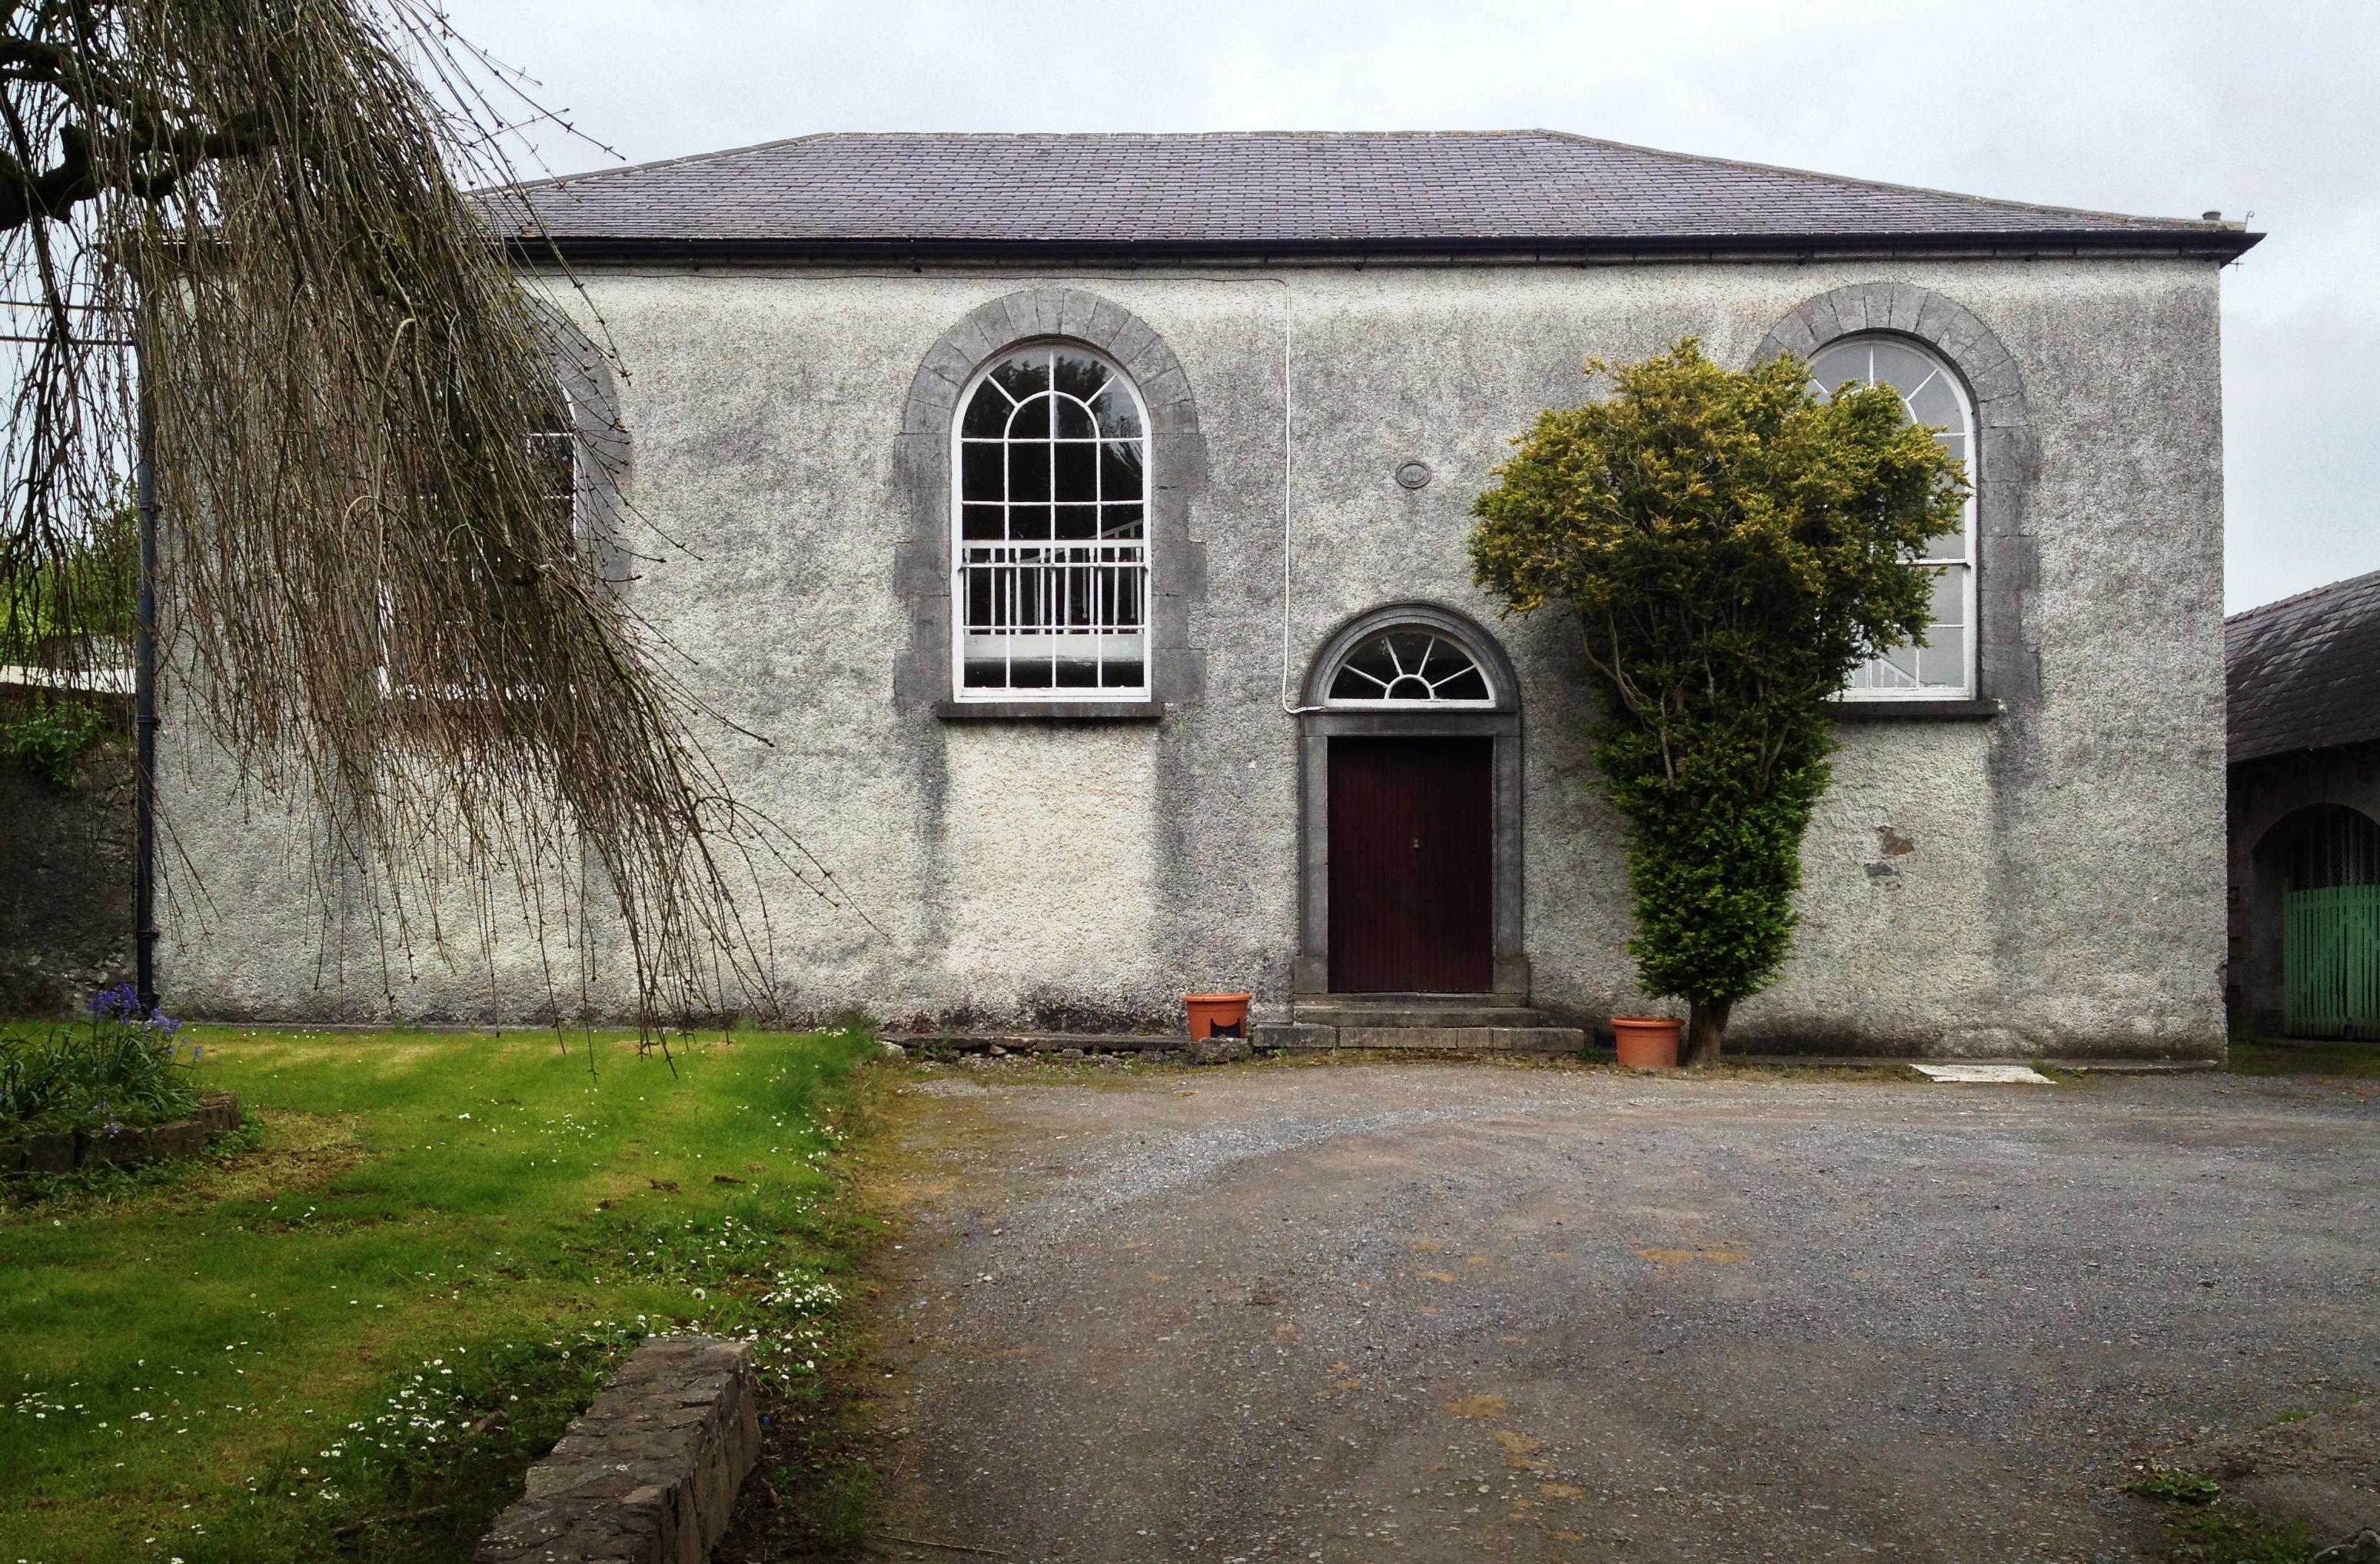 Edenderry get laid - Ireland tourism - Neural Films